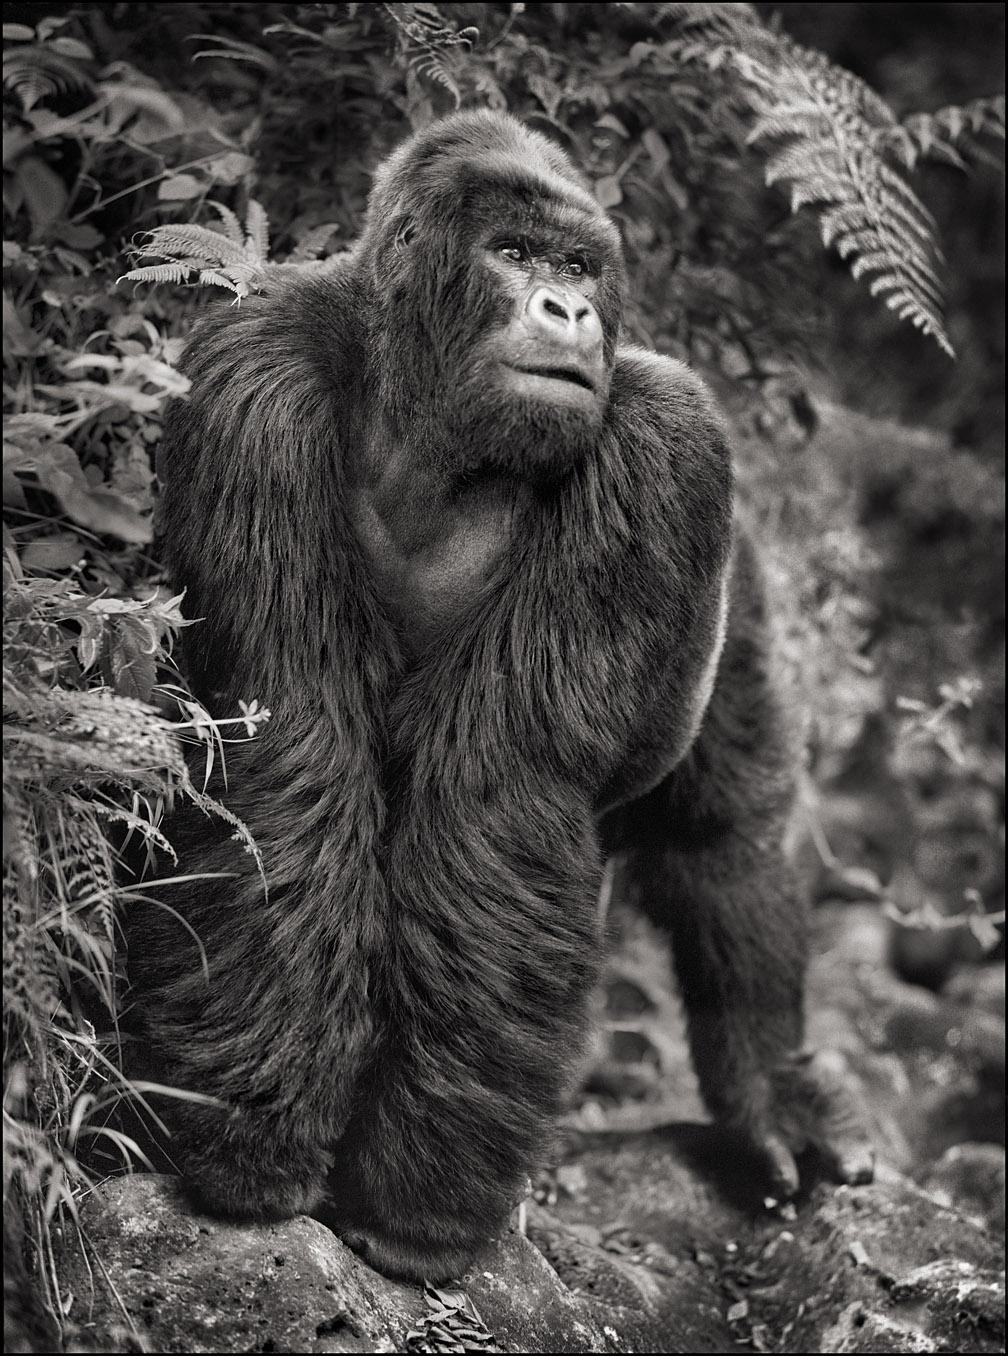 Gorilla on Rock, Parc des Volcans, 2008